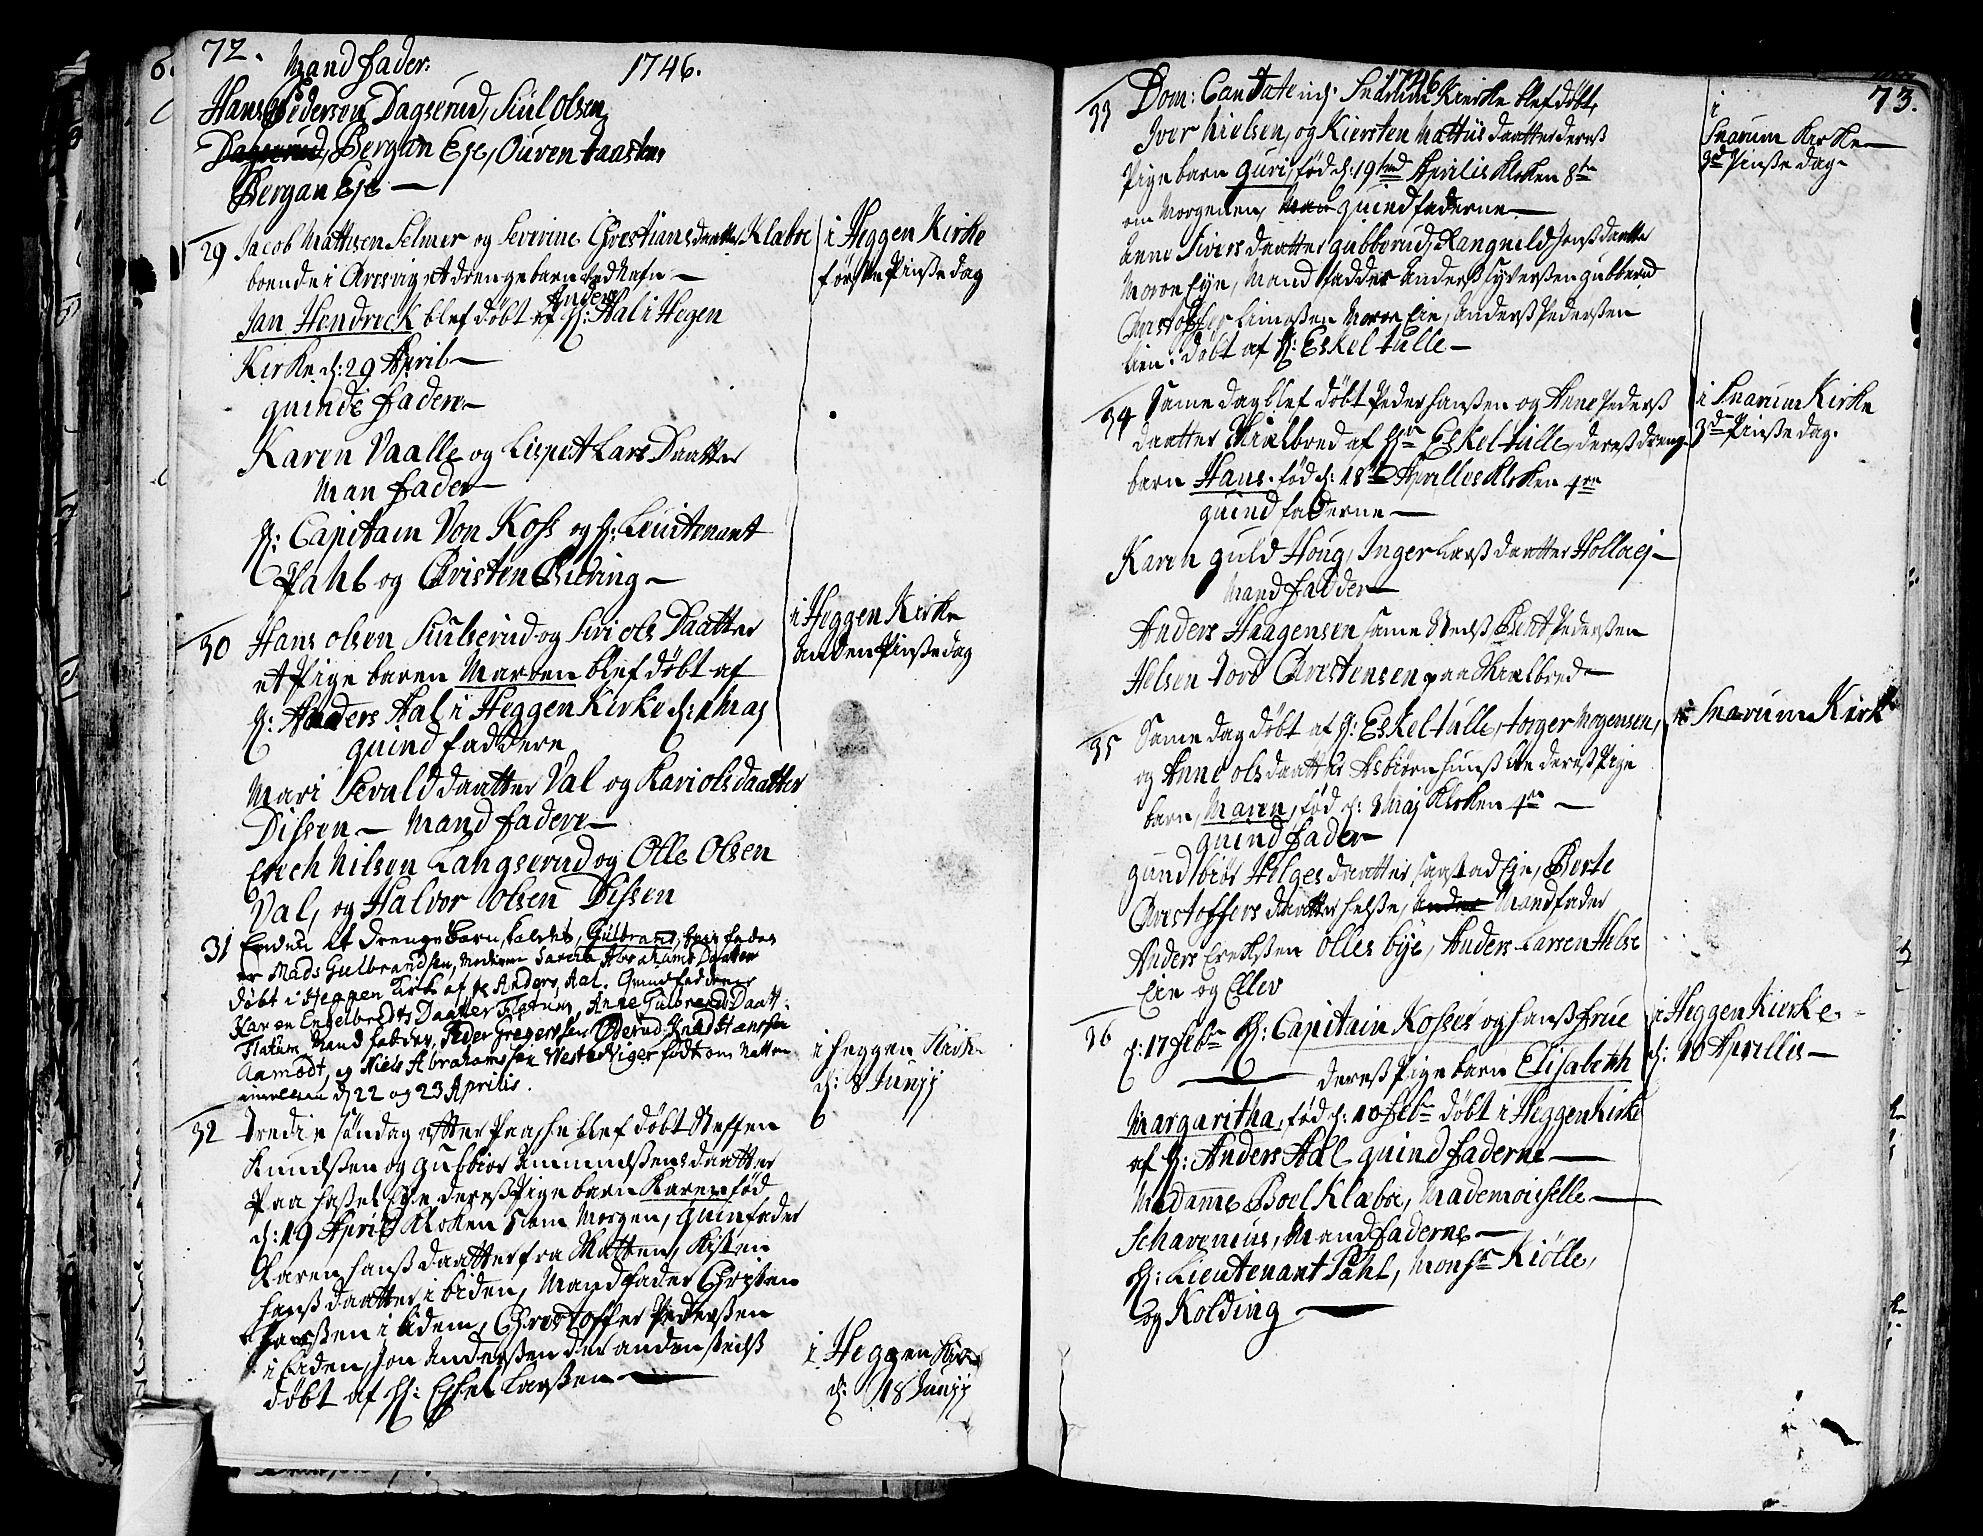 SAKO, Modum kirkebøker, F/Fa/L0002: Ministerialbok nr. 2, 1741-1782, s. 72-73